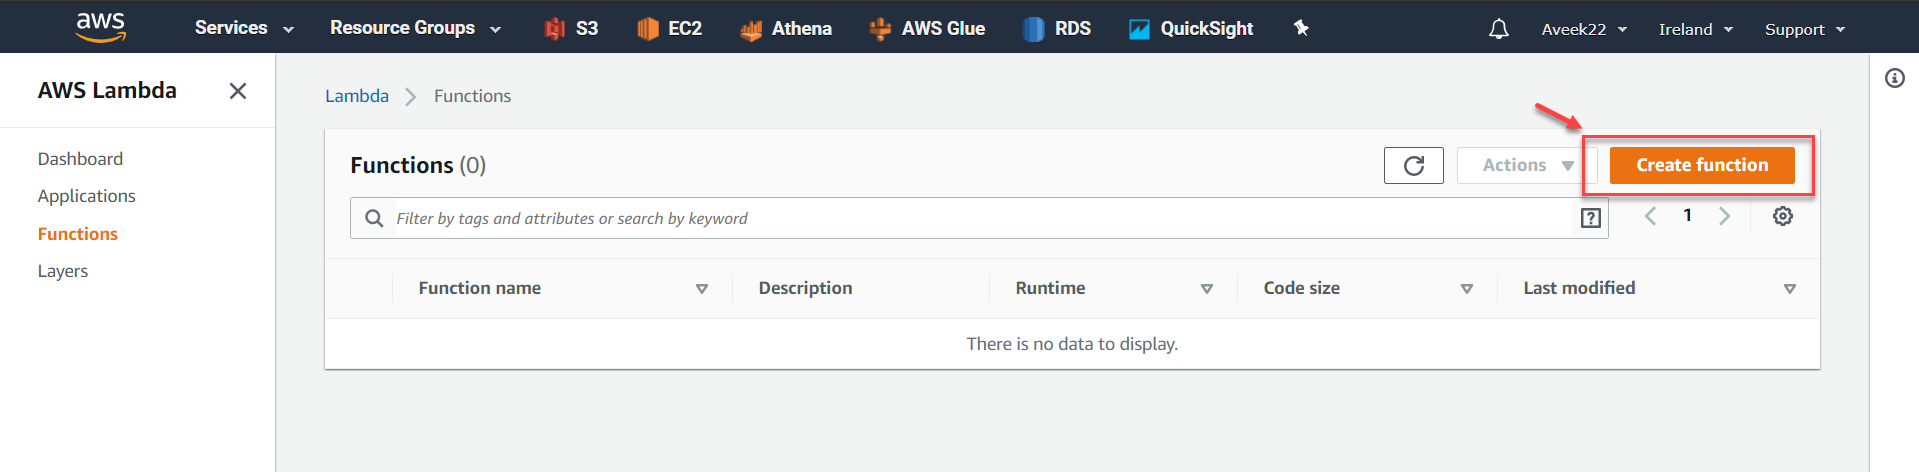 Create AWS Lambda Function